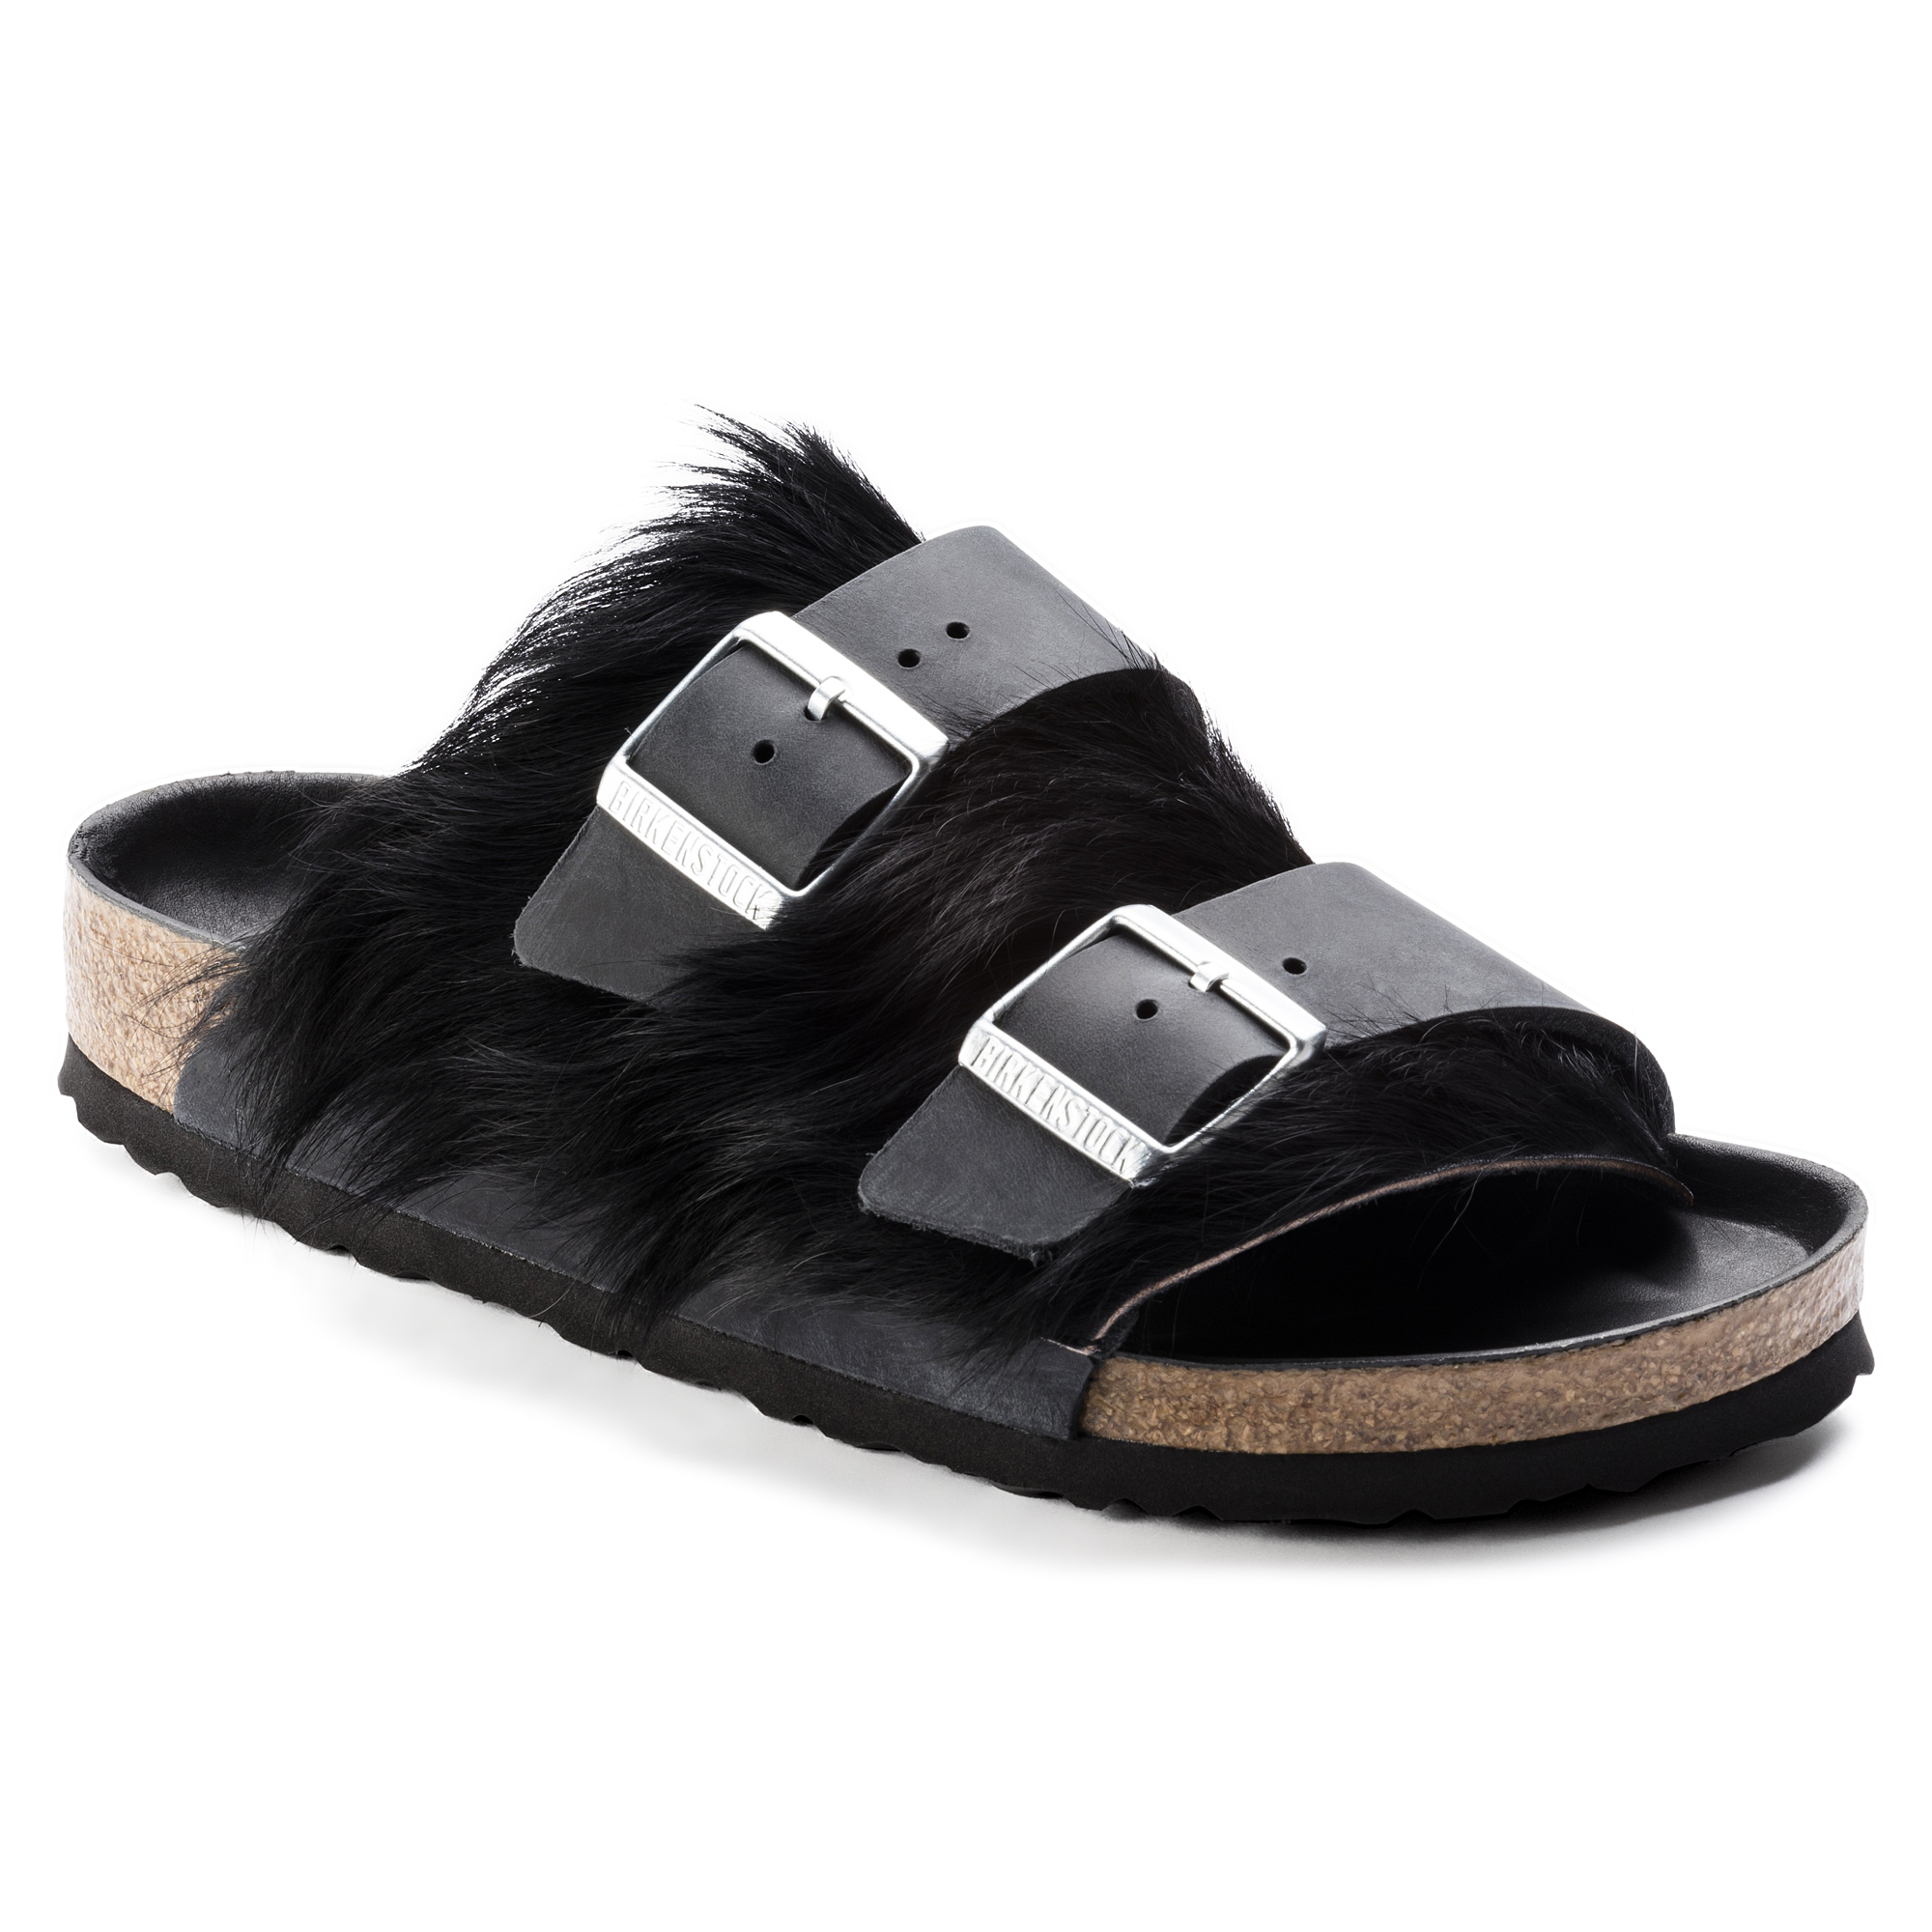 Arizona Natural Leather/Fur | shop